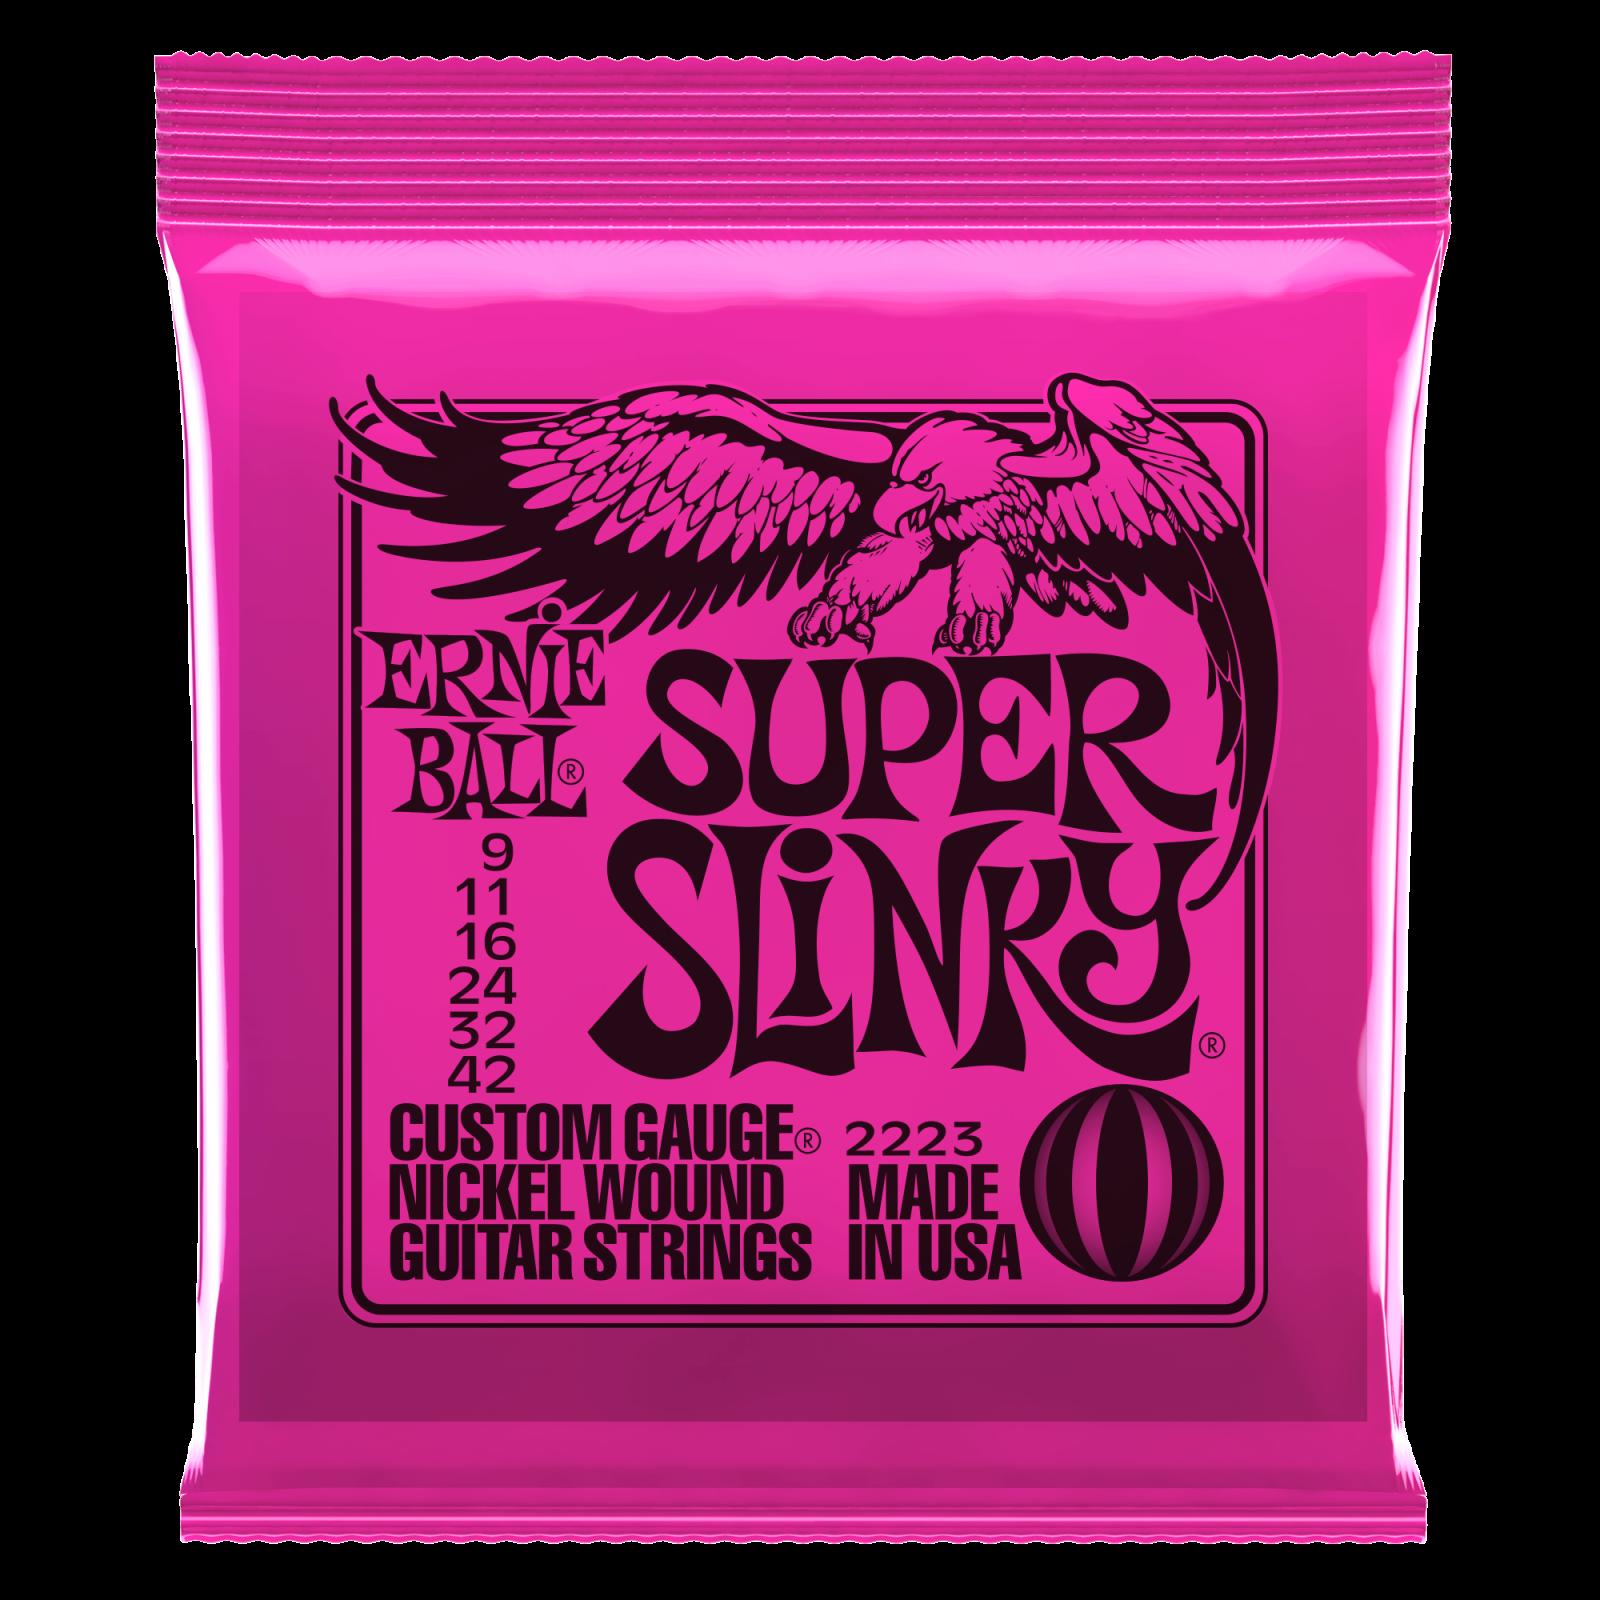 Ernie Ball Super Slinky 2223 Electric Guitar Strings, Nickel Wound, 9-42